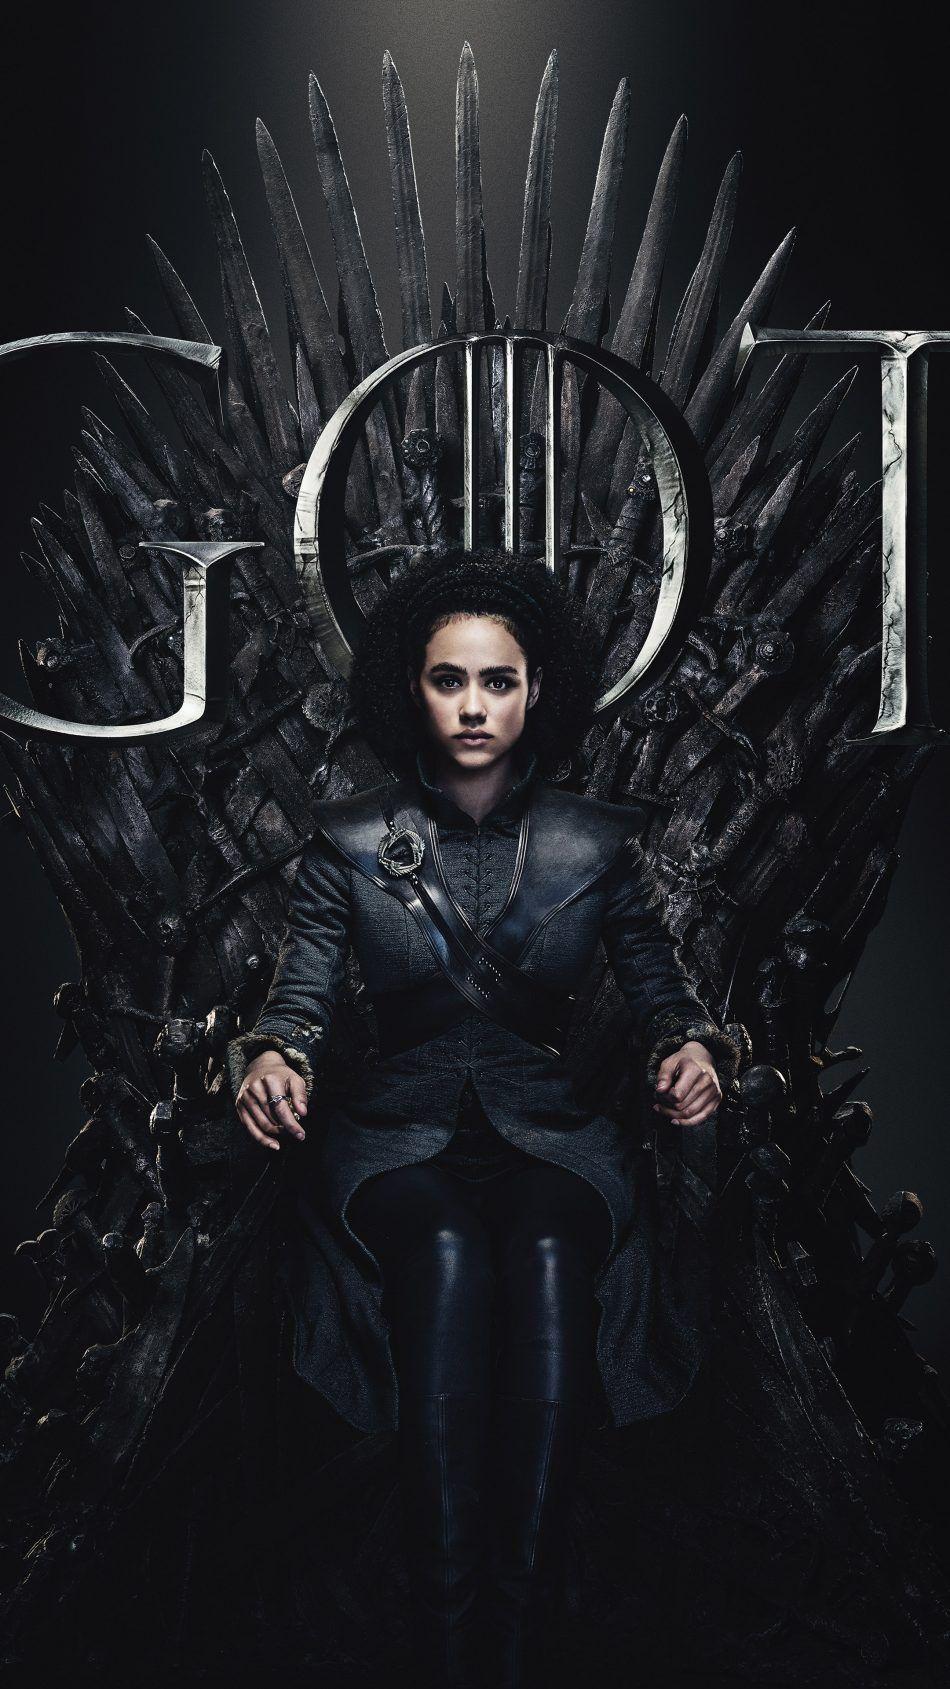 Missandei Game Of Thrones Season 8 4k Ultra Hd Mobile Wallpaper Game Of Thrones Sansa Sansa Stark Nathalie Emmanuel